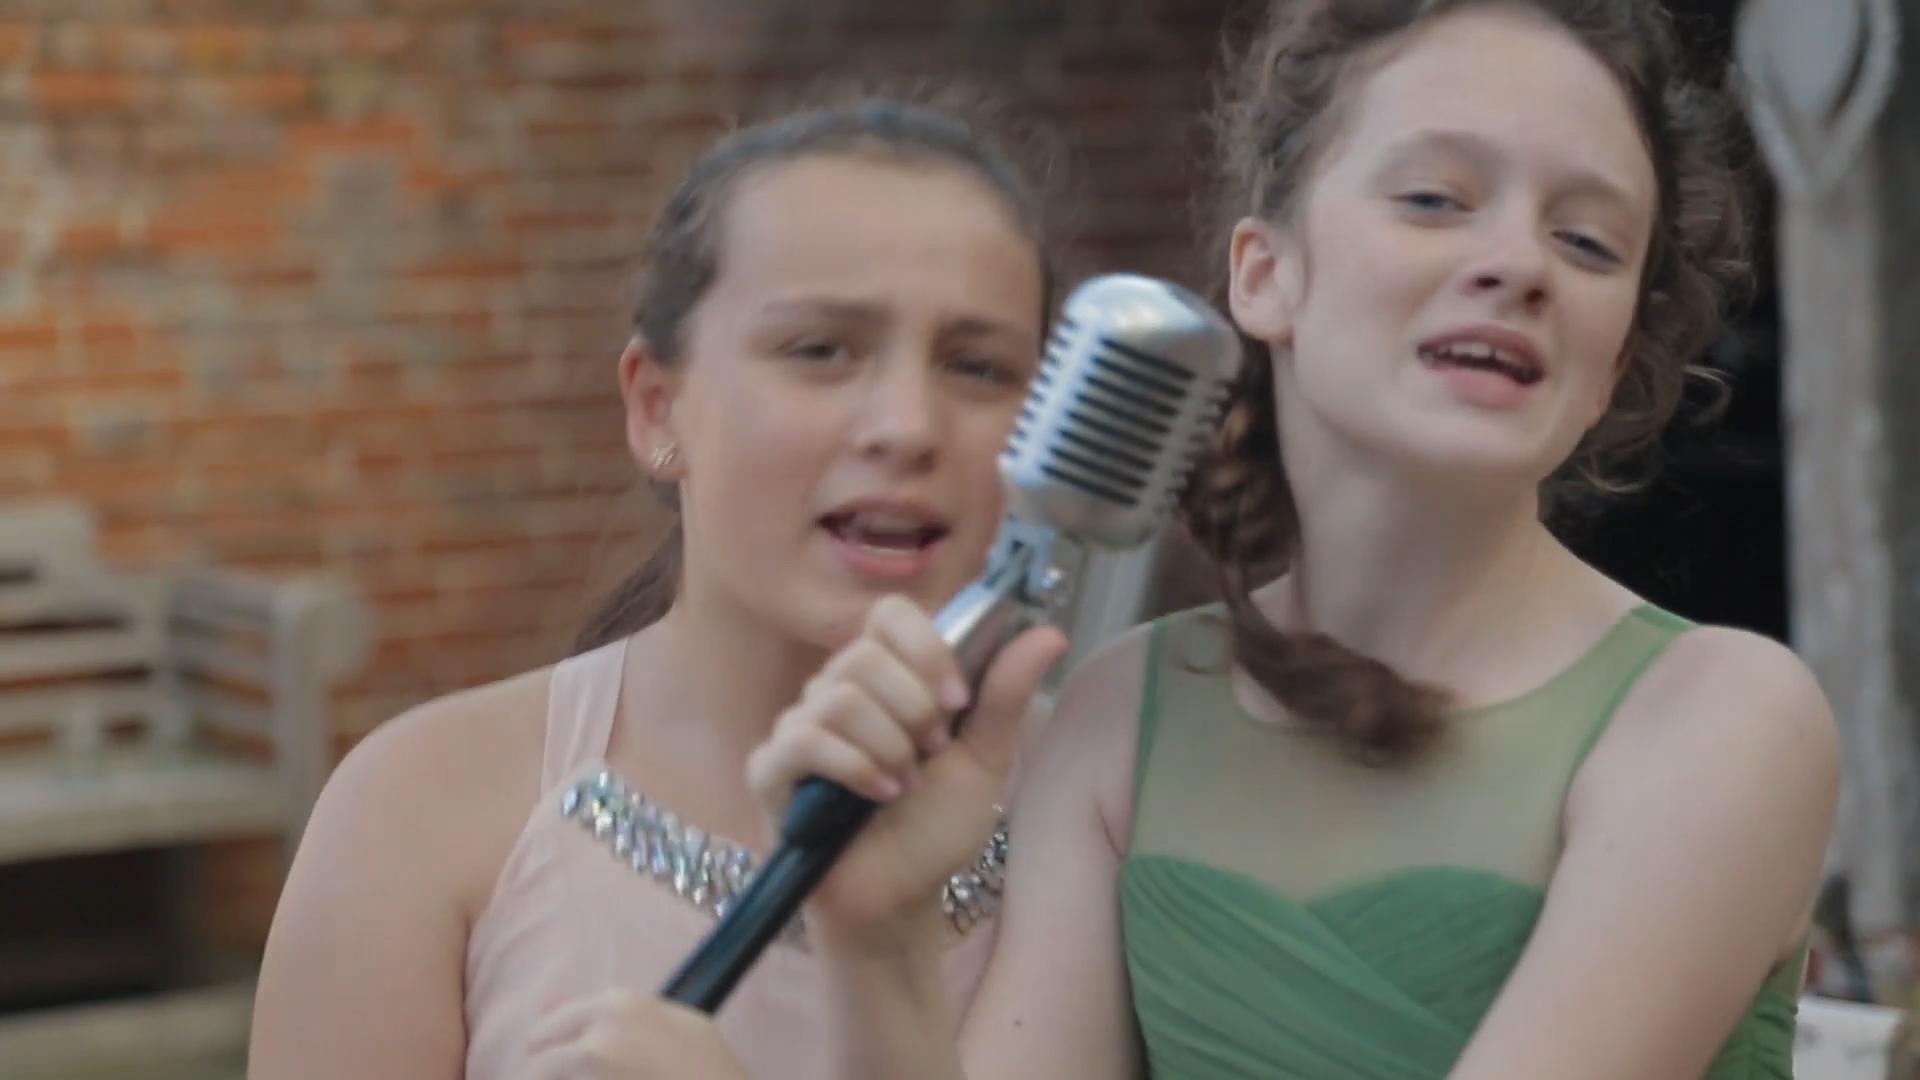 girls-microphone-marryoke-norfolk-wedding-videography-6